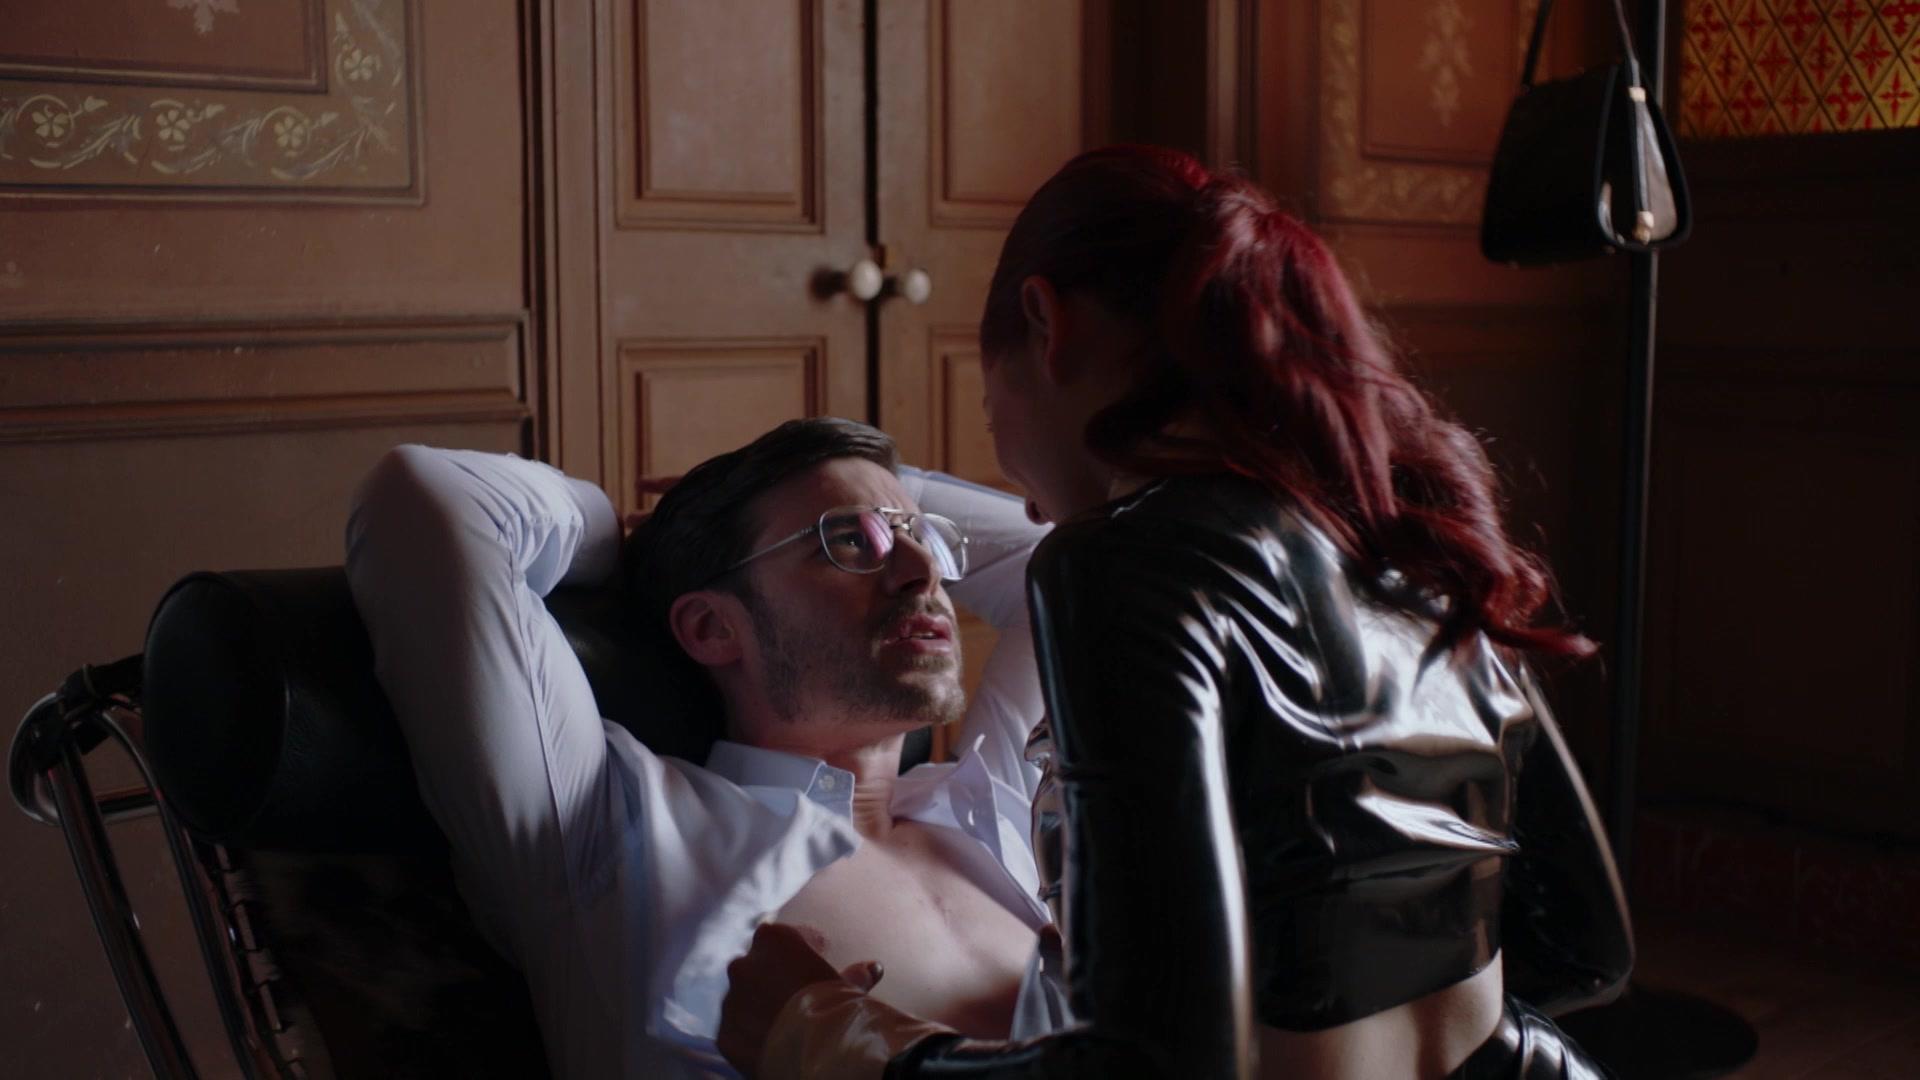 Playboy TV: XConfessions, Season 2 Ep. 5 38